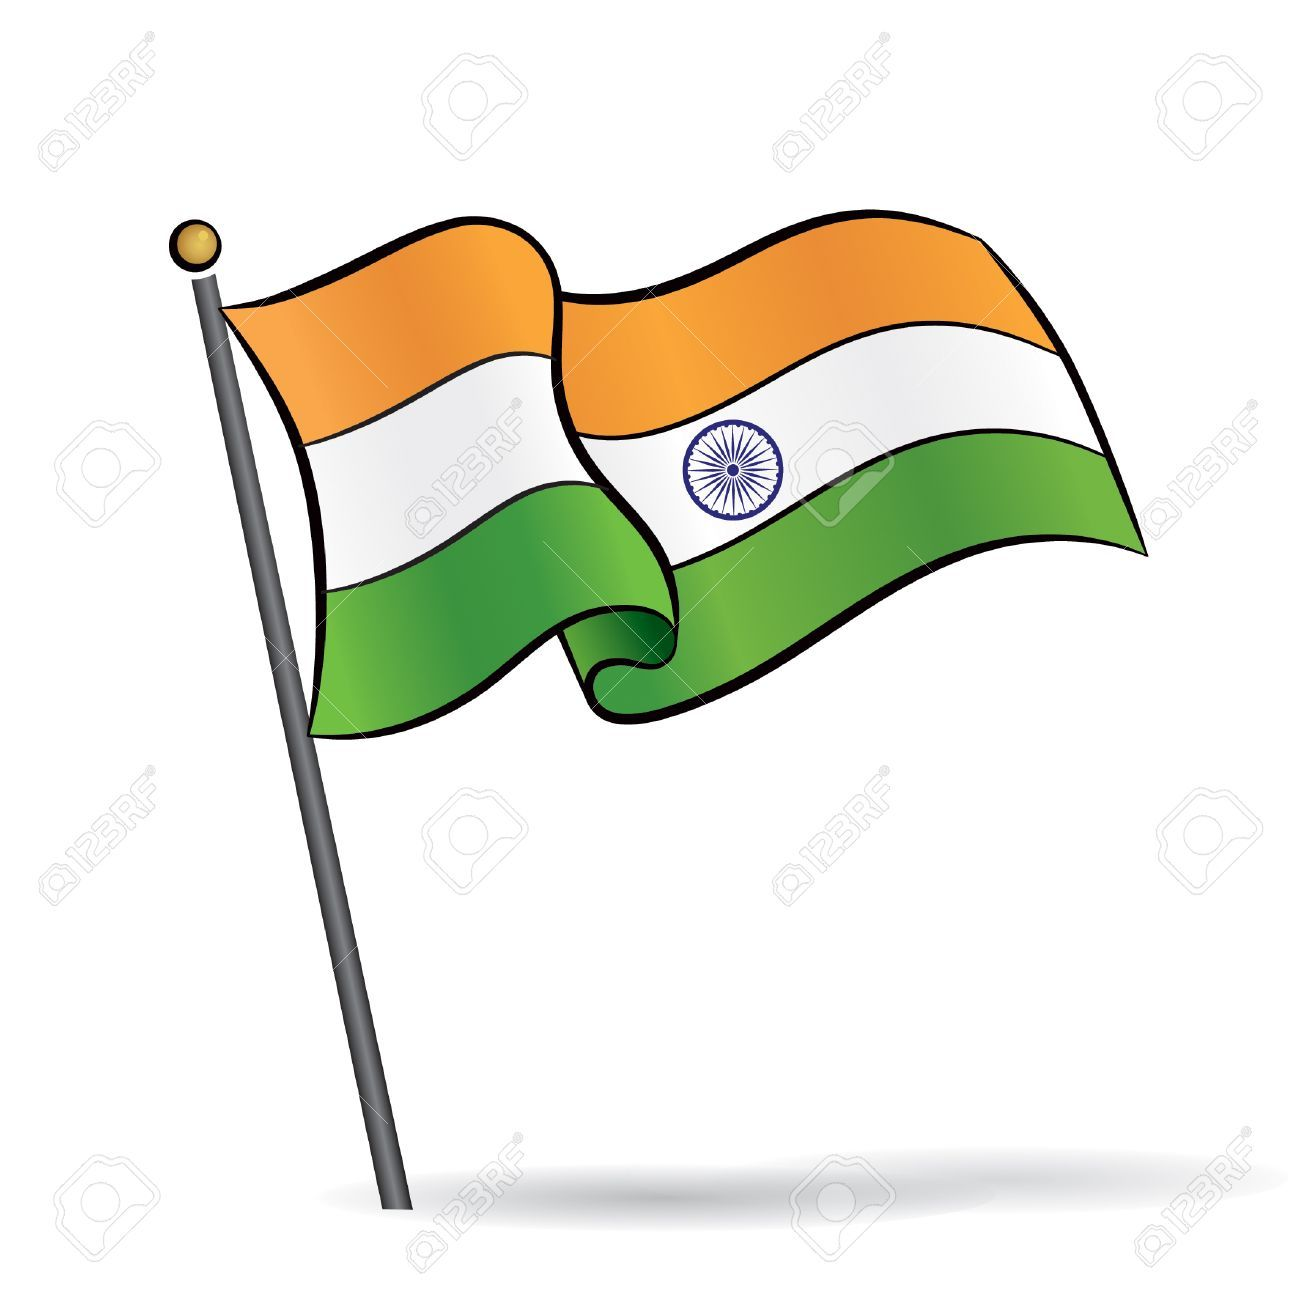 Indian flag clipart images 2 » Clipart Portal.